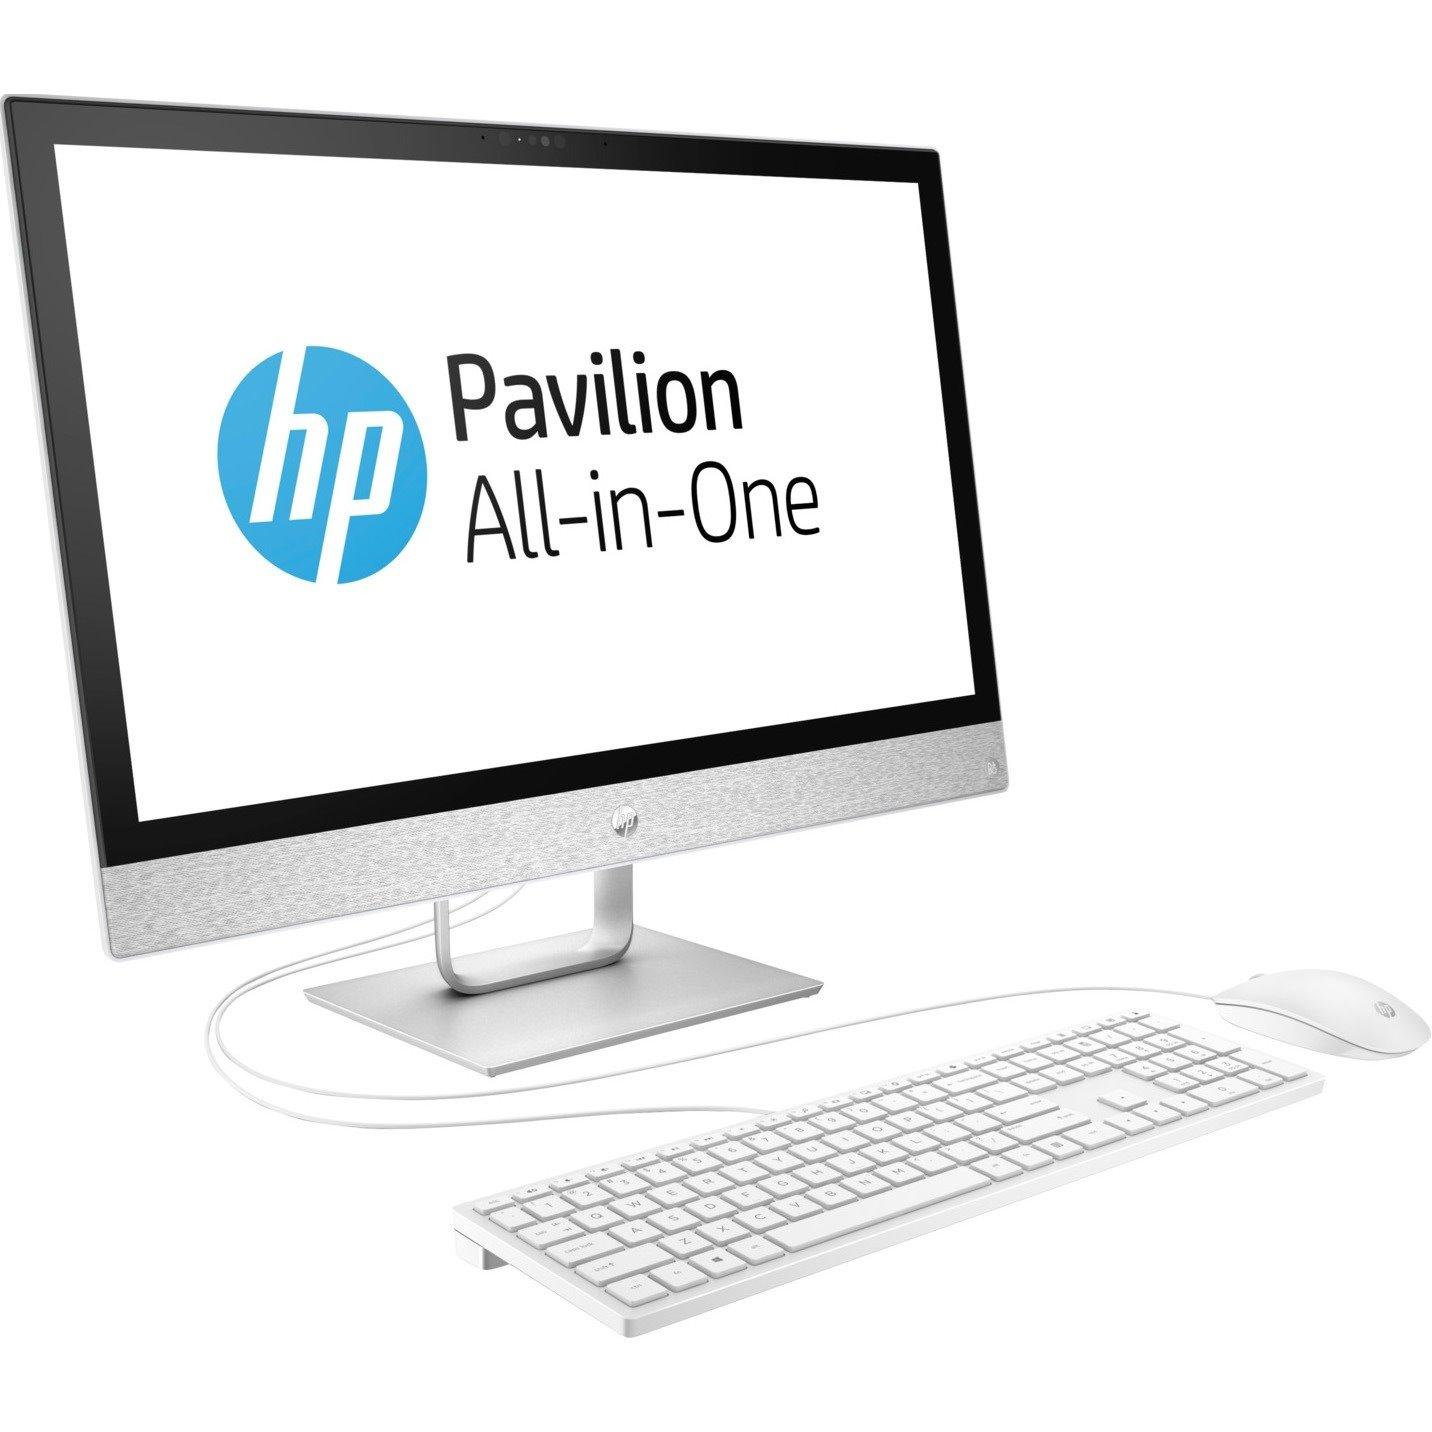 "HP Pavilion 24-r100 24-r159a All-in-One Computer - Intel Core i5 i5-8400T 1.70 GHz - 8 GB DDR4 SDRAM - 1 TB HDD - 60.5 cm (23.8"") 1920 x 1080 Touchscreen Display - Windows 10 Home 64-bit - Desktop"